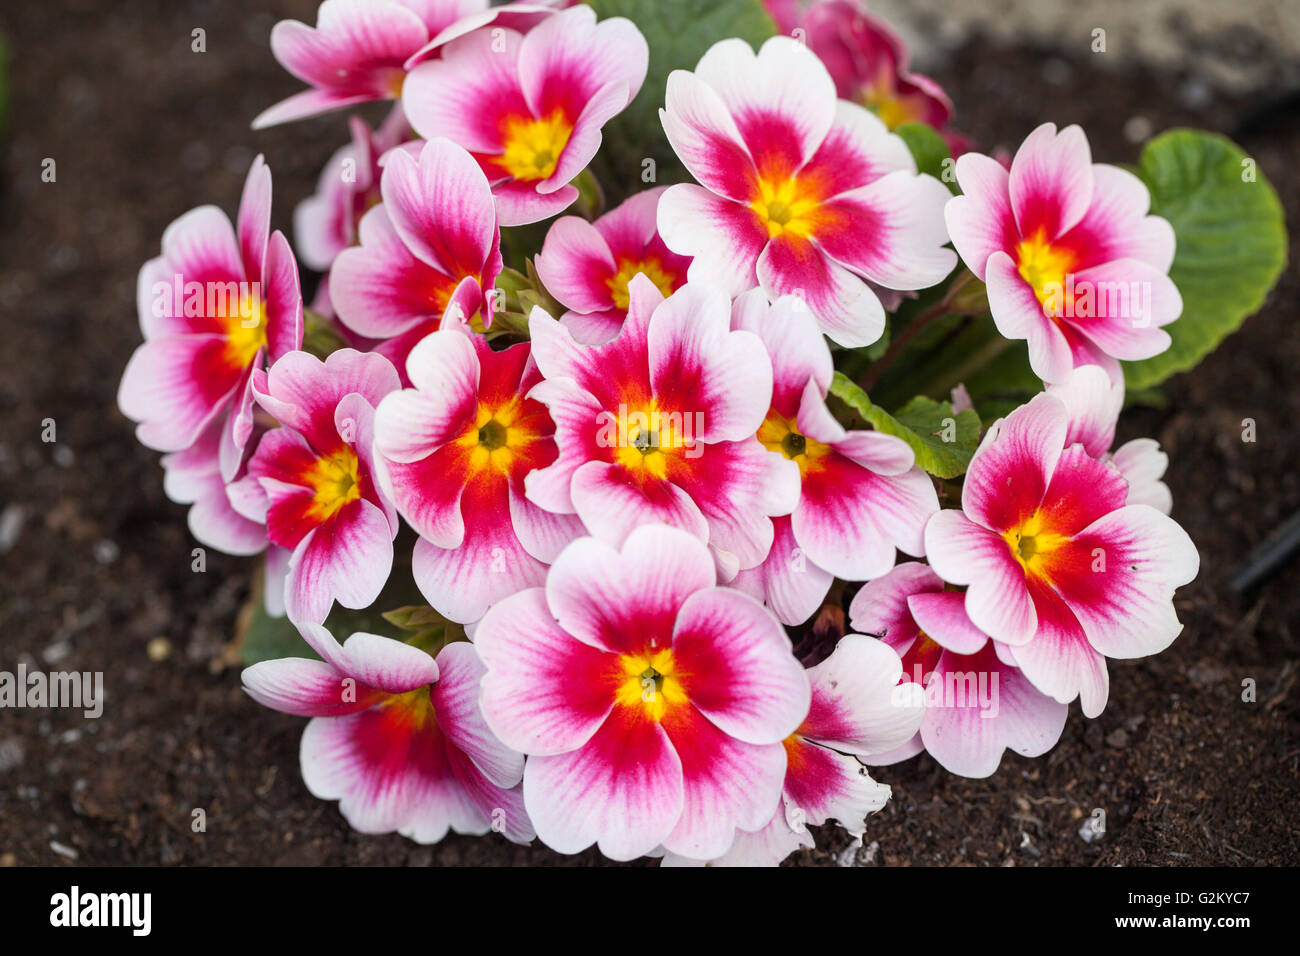 Close up of a beautiful pink primrose in an English spring garden, UK Stock Photo